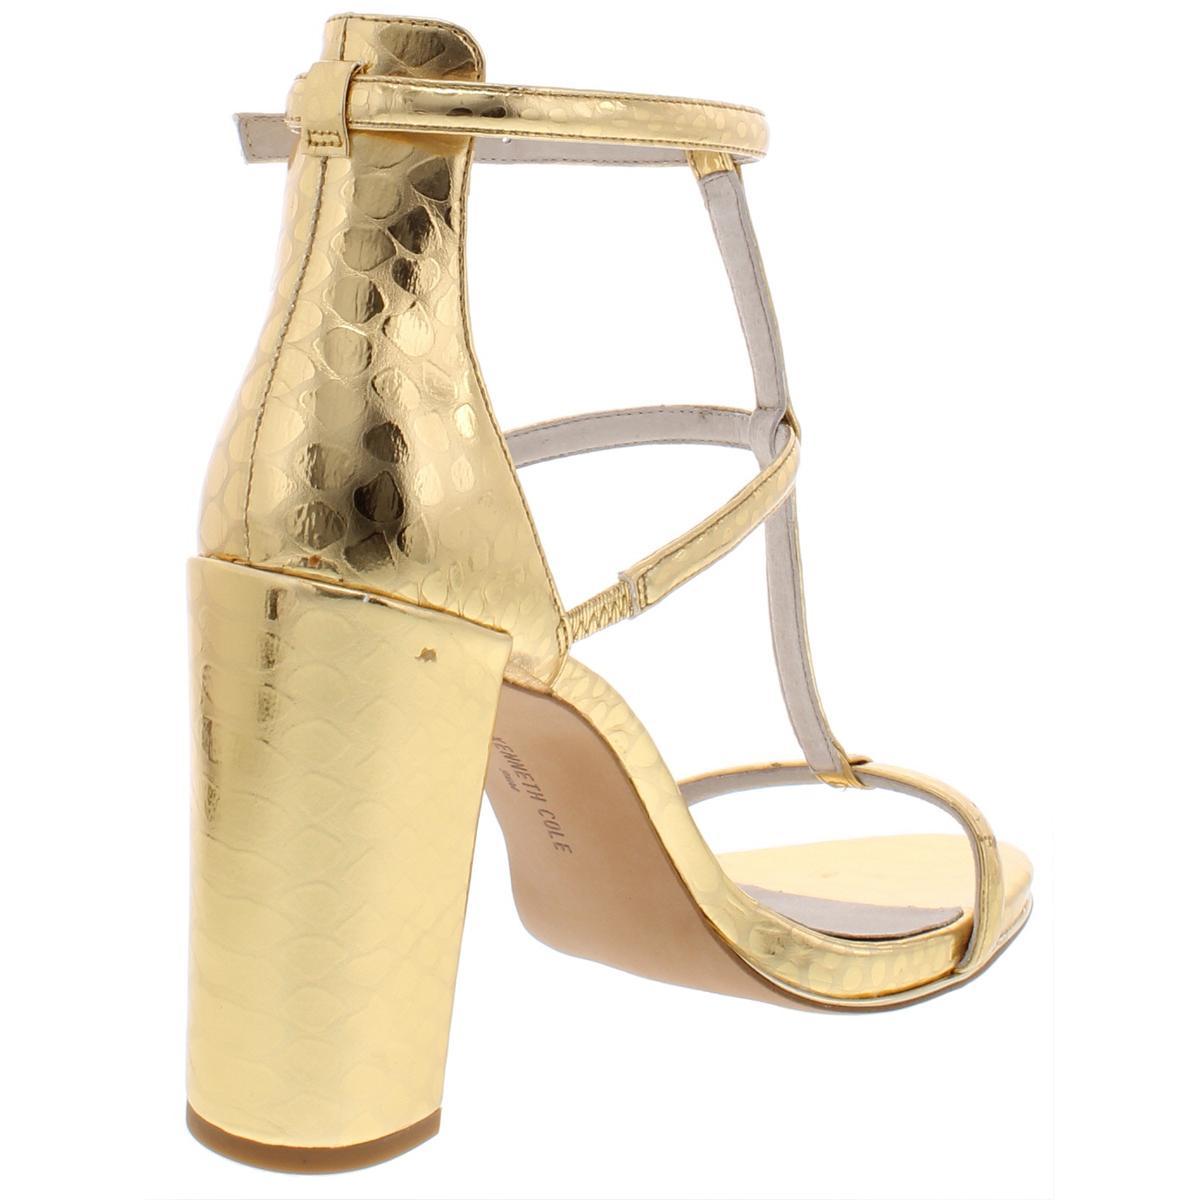 Kenneth-Cole-New-York-Womens-Deandra-Pattern-Dress-Sandals-Shoes-BHFO-5019 thumbnail 4